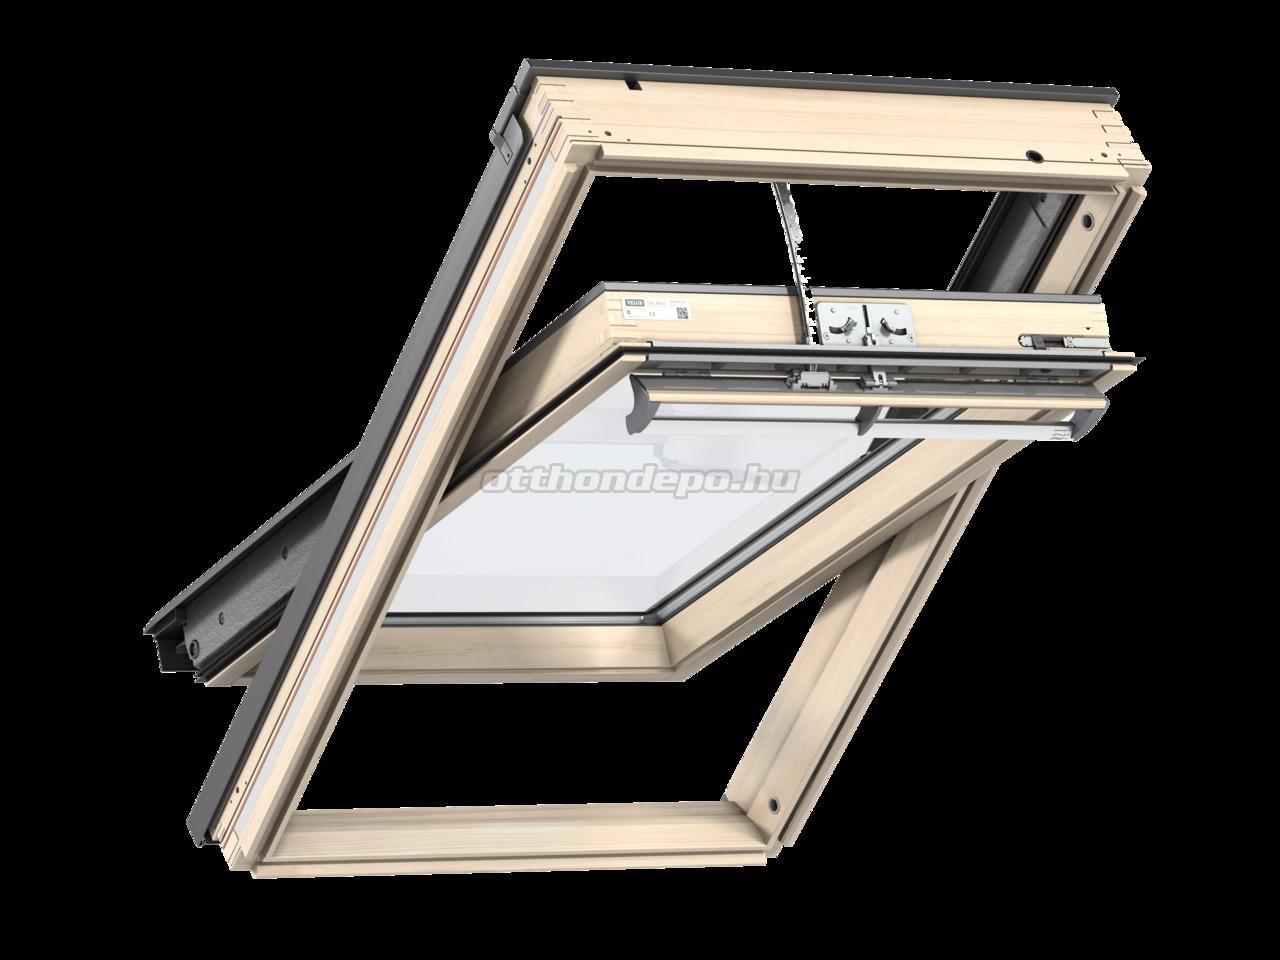 velux tet t ri ablak ggl pk10 306021 94x160 cm otthon depo web ruh z. Black Bedroom Furniture Sets. Home Design Ideas